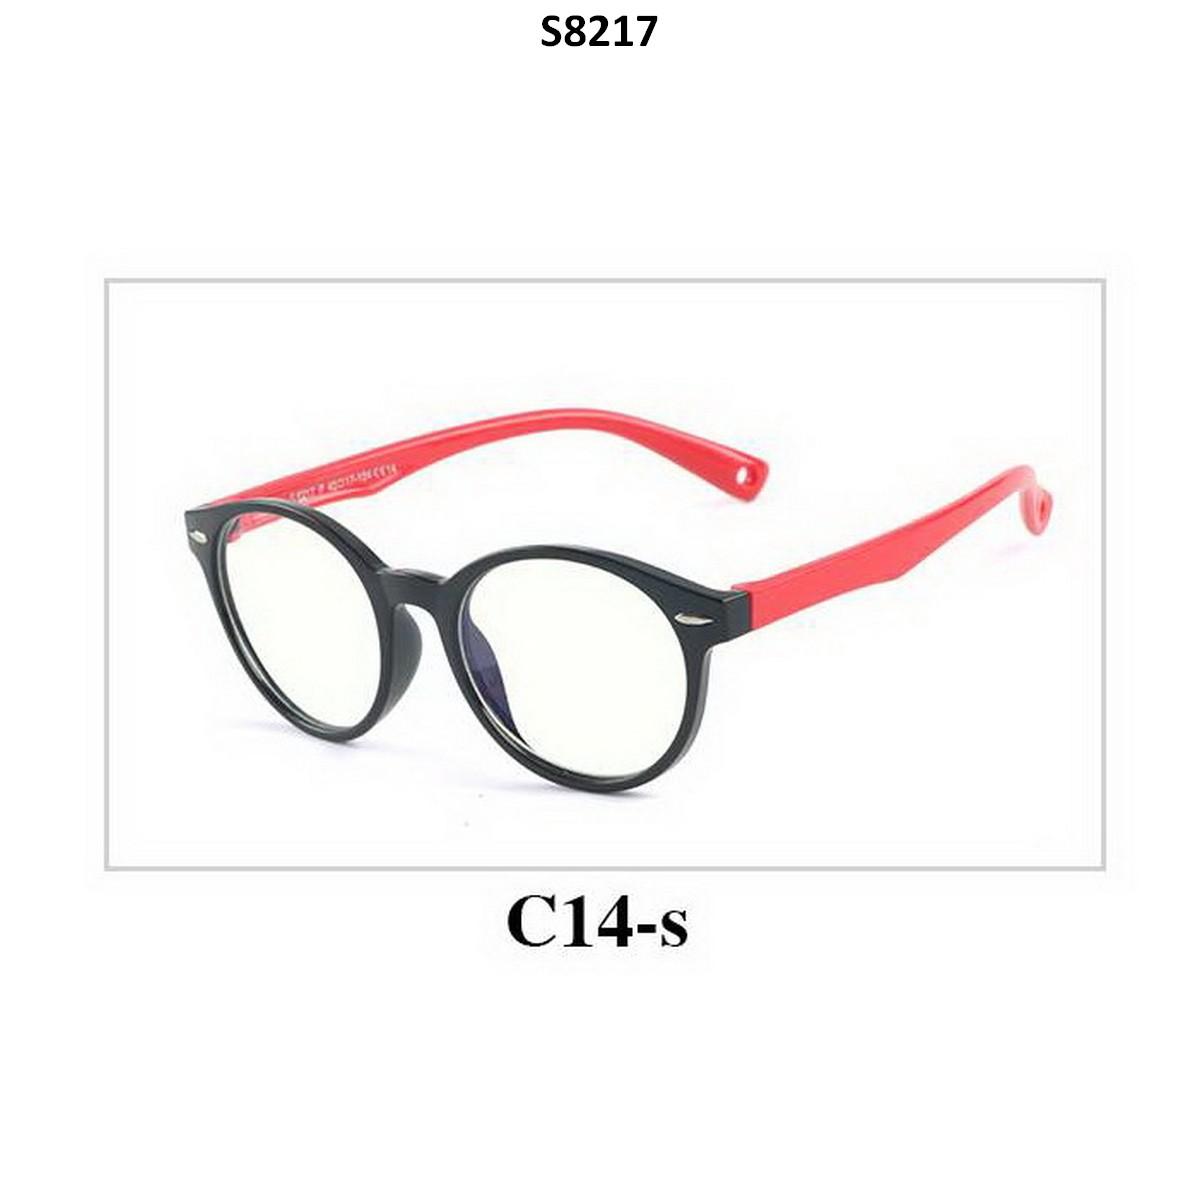 Kids Blue Light Blocker Computer Glasses Anti Blue Ray Eyeglasses S8217C14